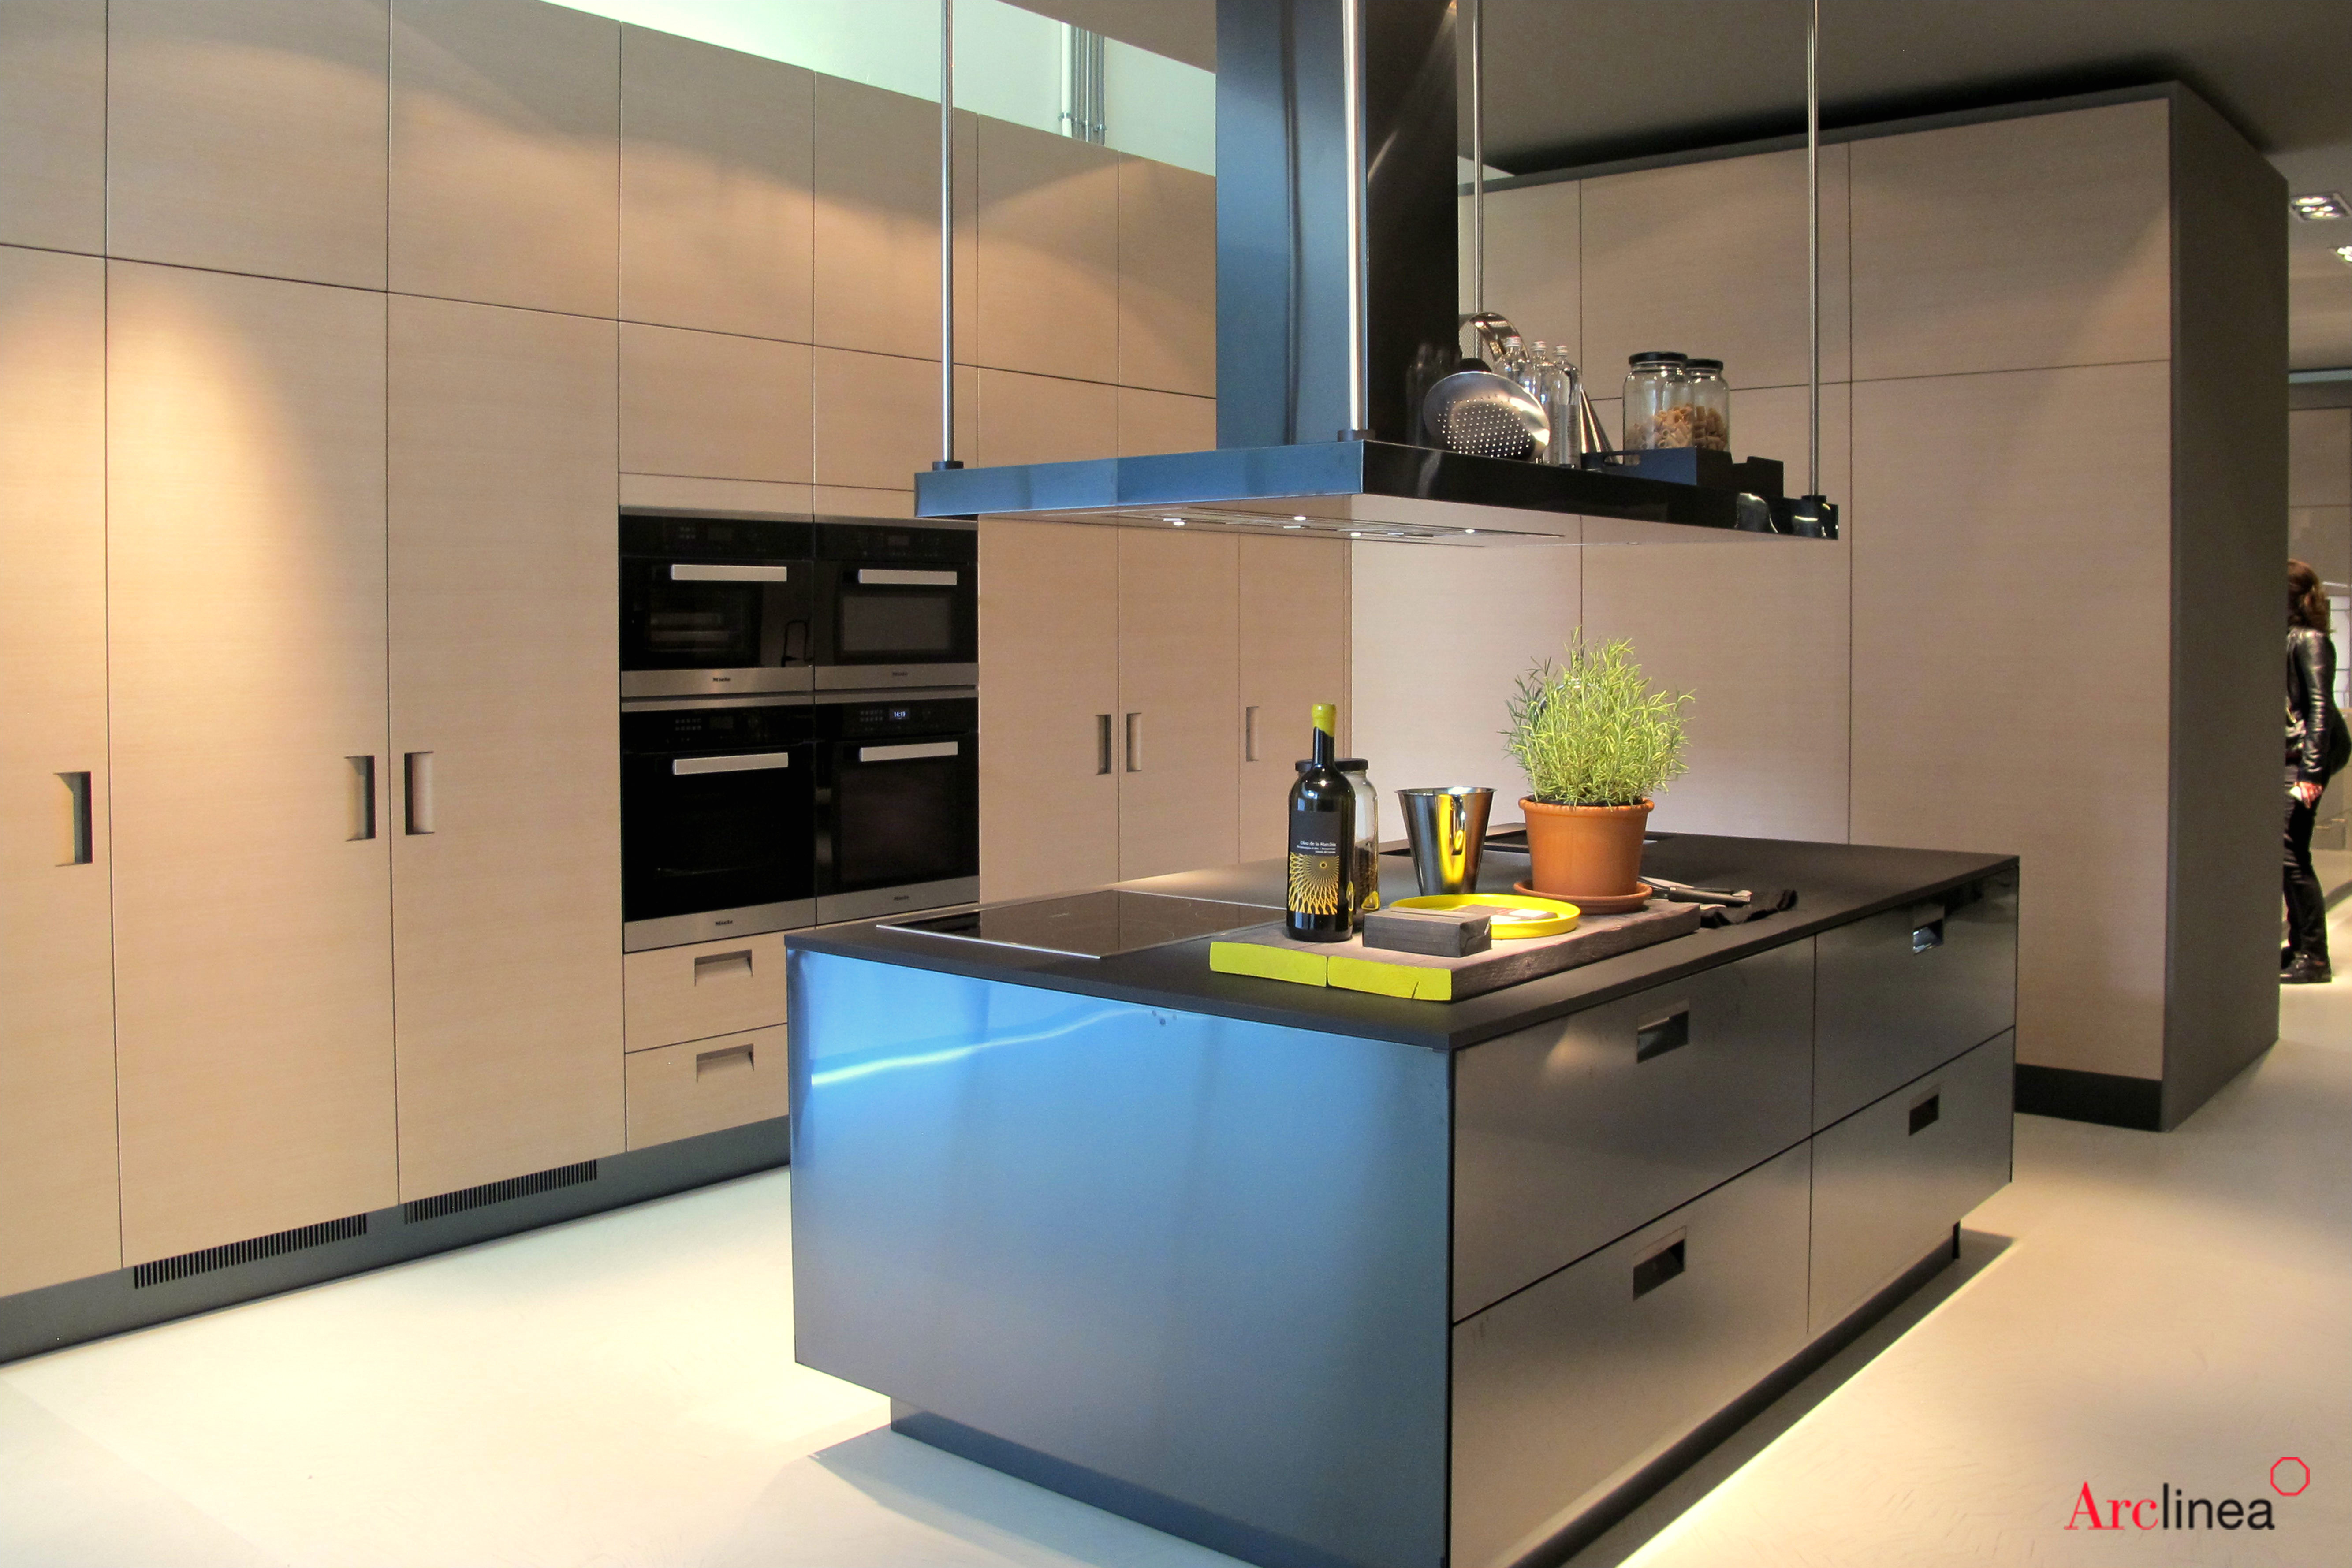 disea os de cocinas modernas elegante cocinas de diseo italiano finest o disear una cocina tips para